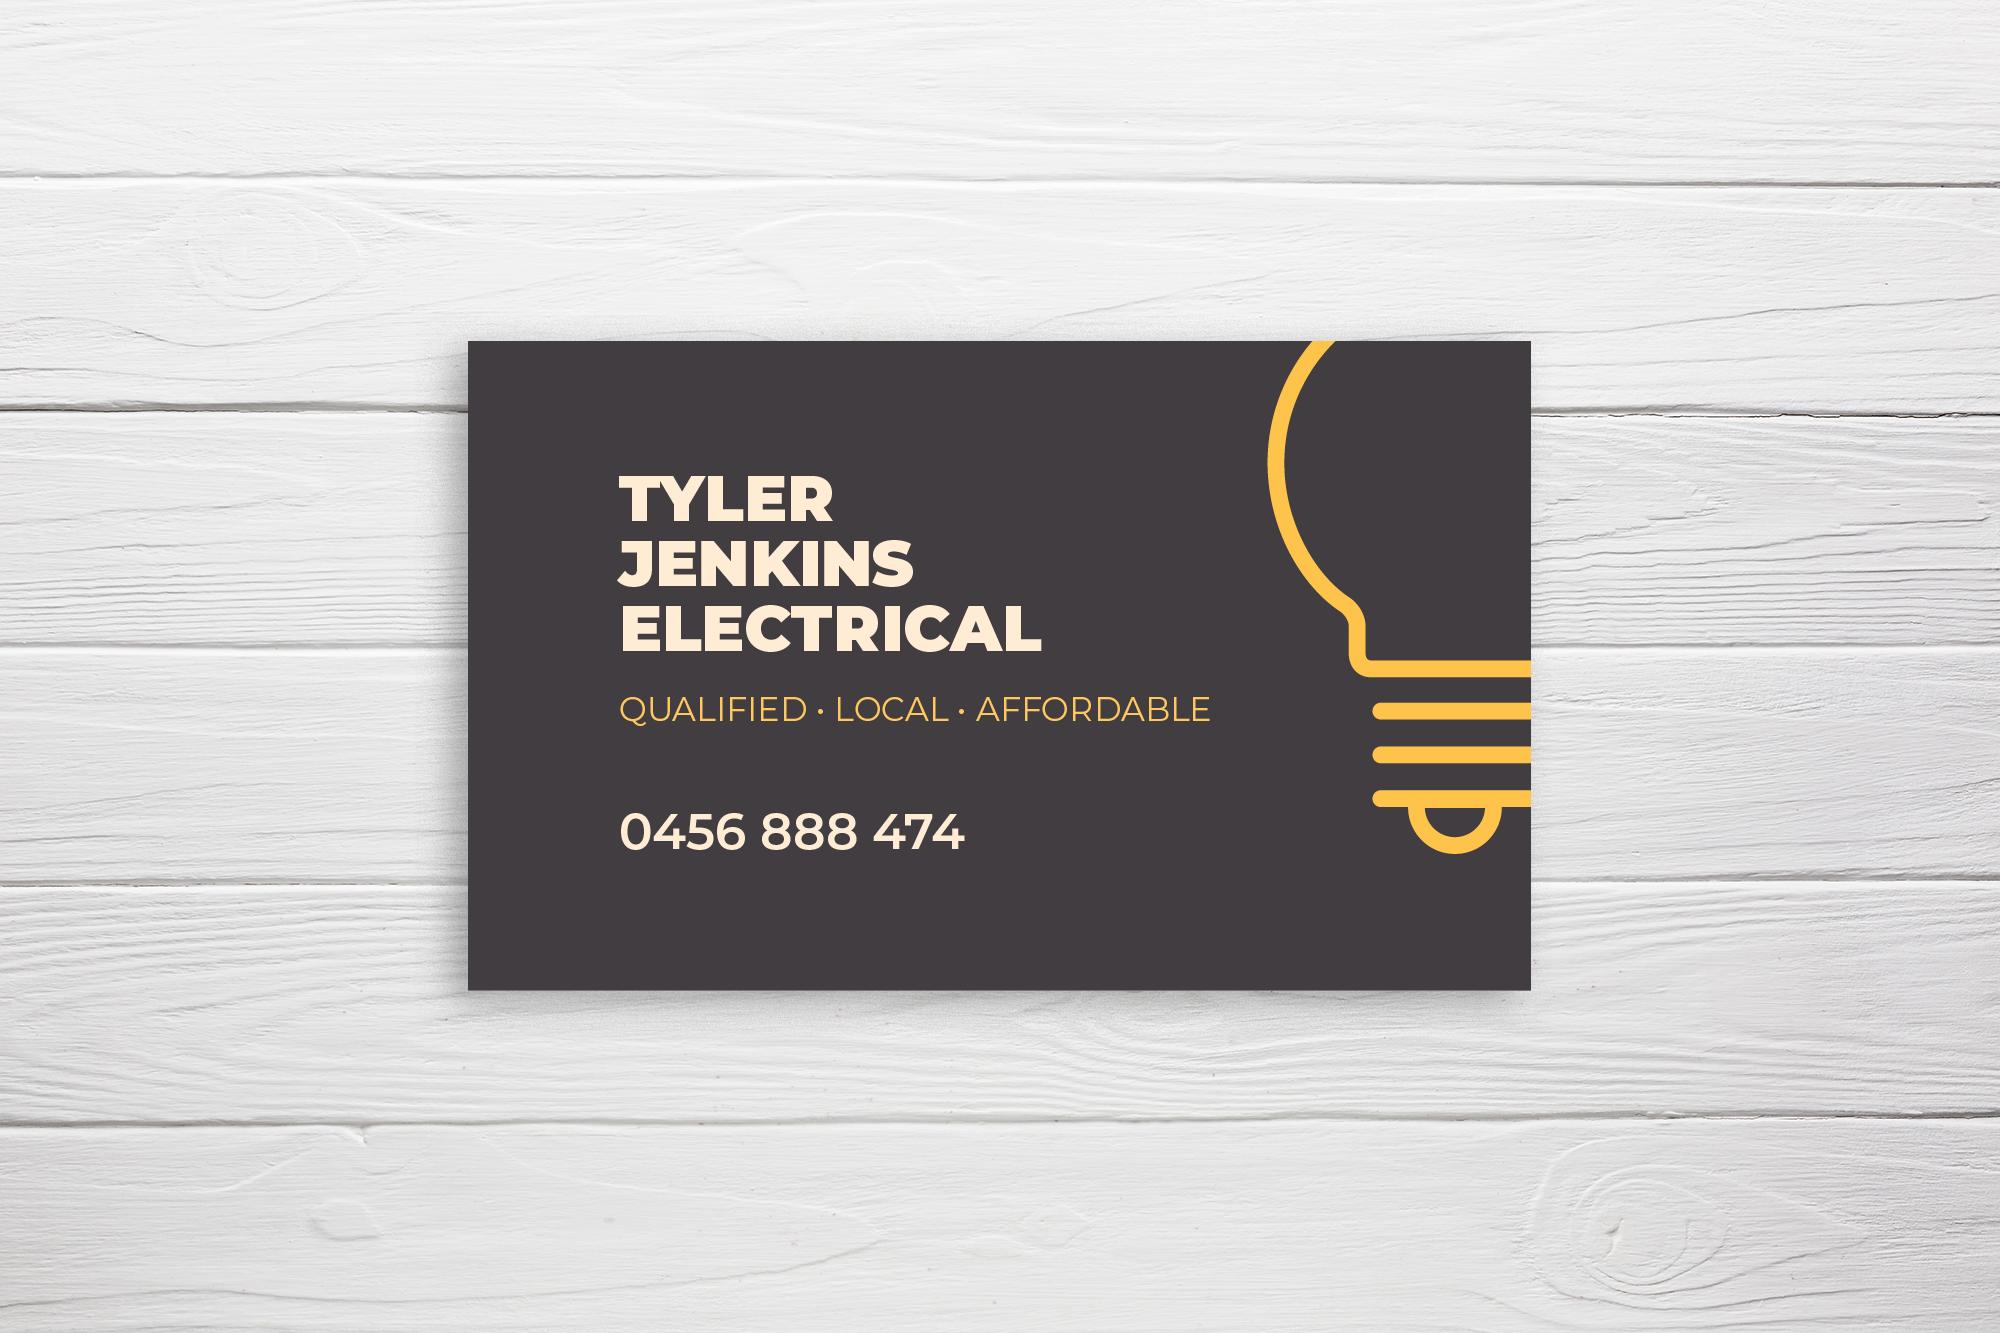 Business Card Design Electrician Business Card Online Business Cards Tradesperson Trade Business Card Business Card Design Minimal Printing Business Cards Business Card Design